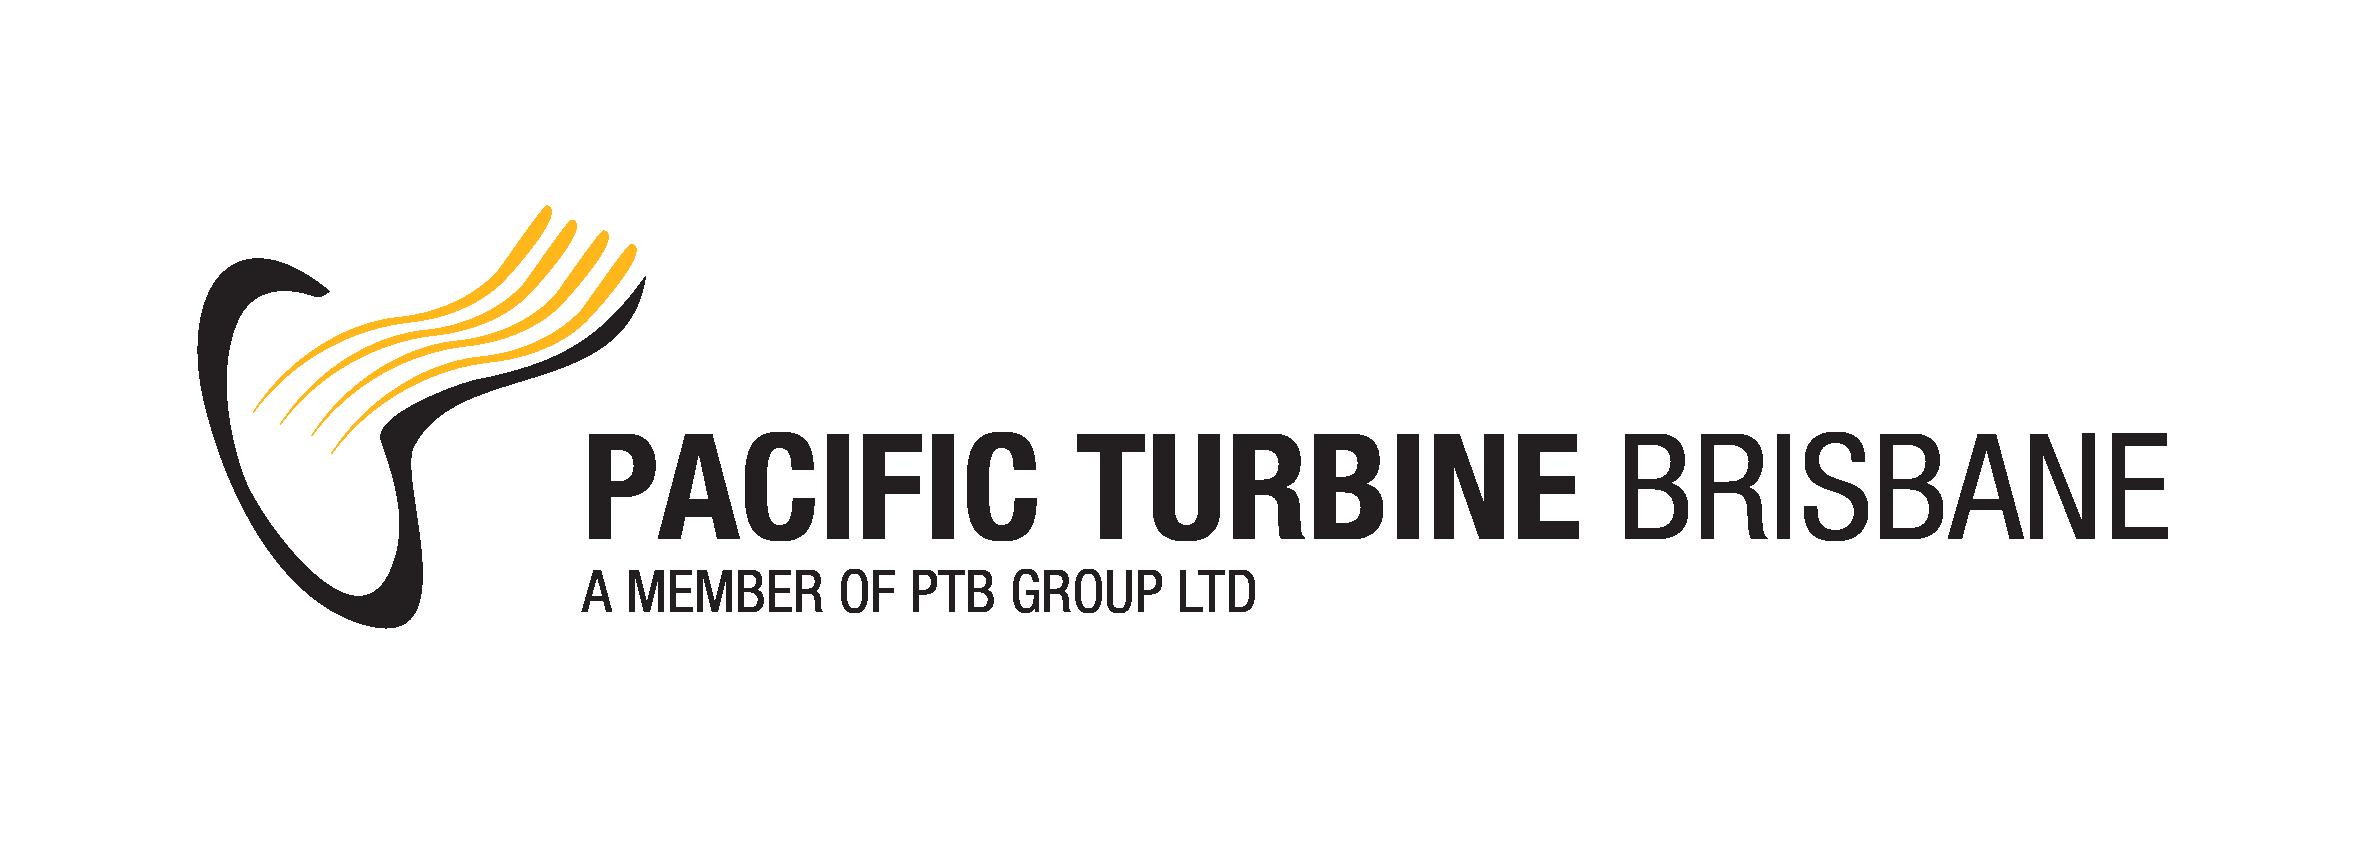 Pacific Turbine Brisbane